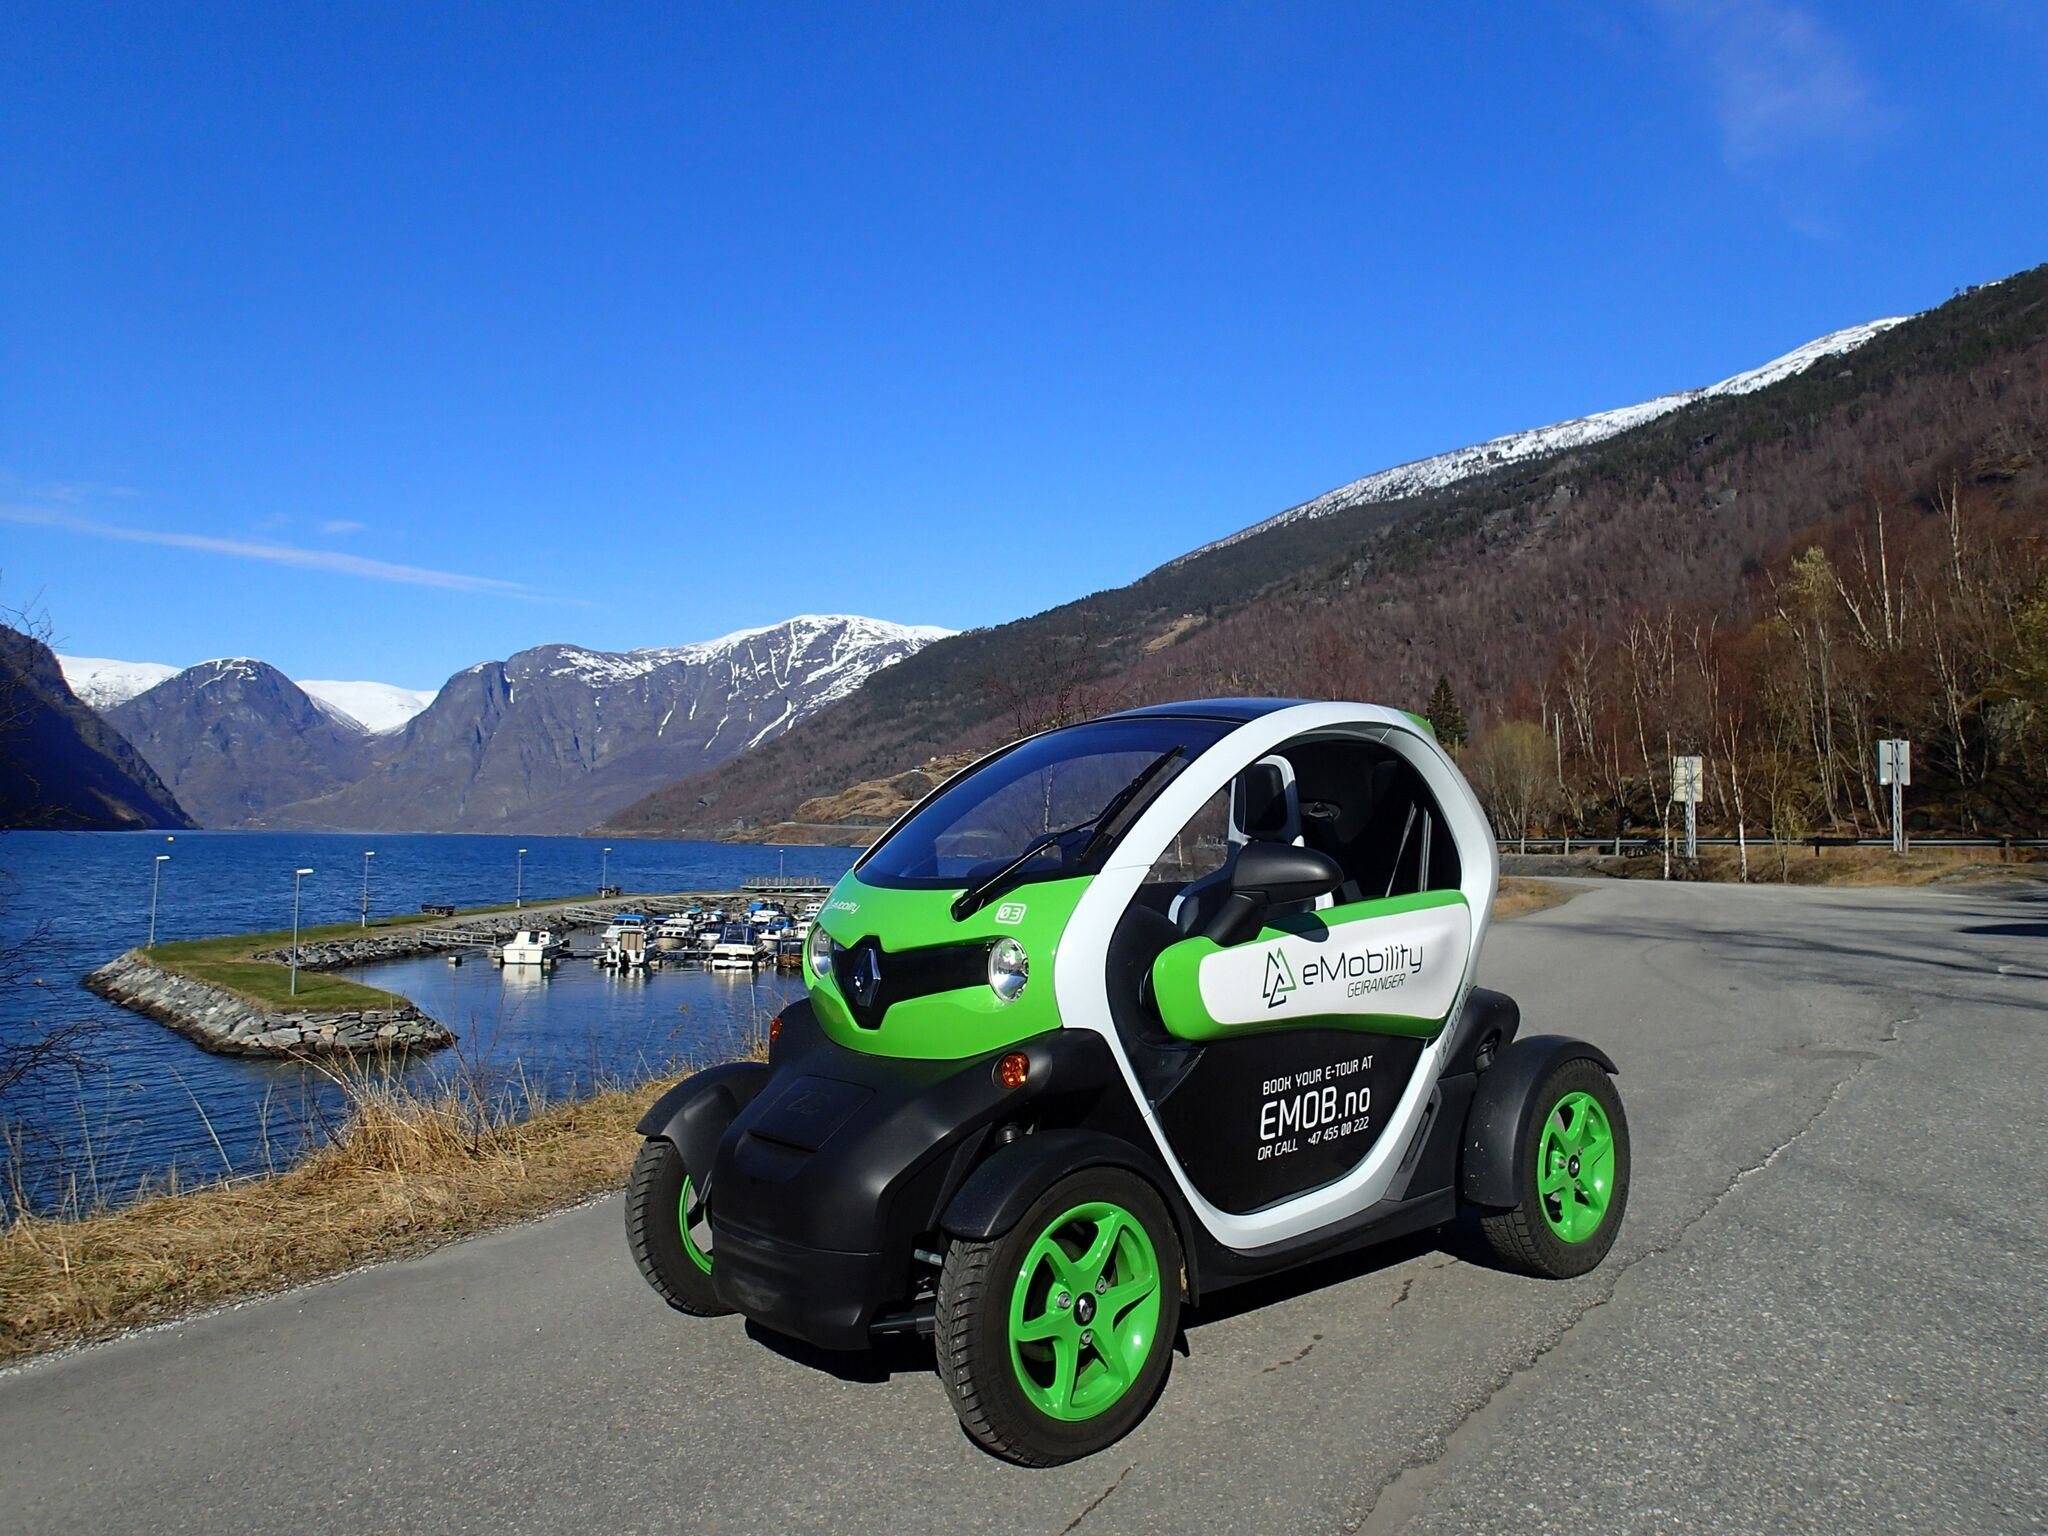 eMobility Flåm